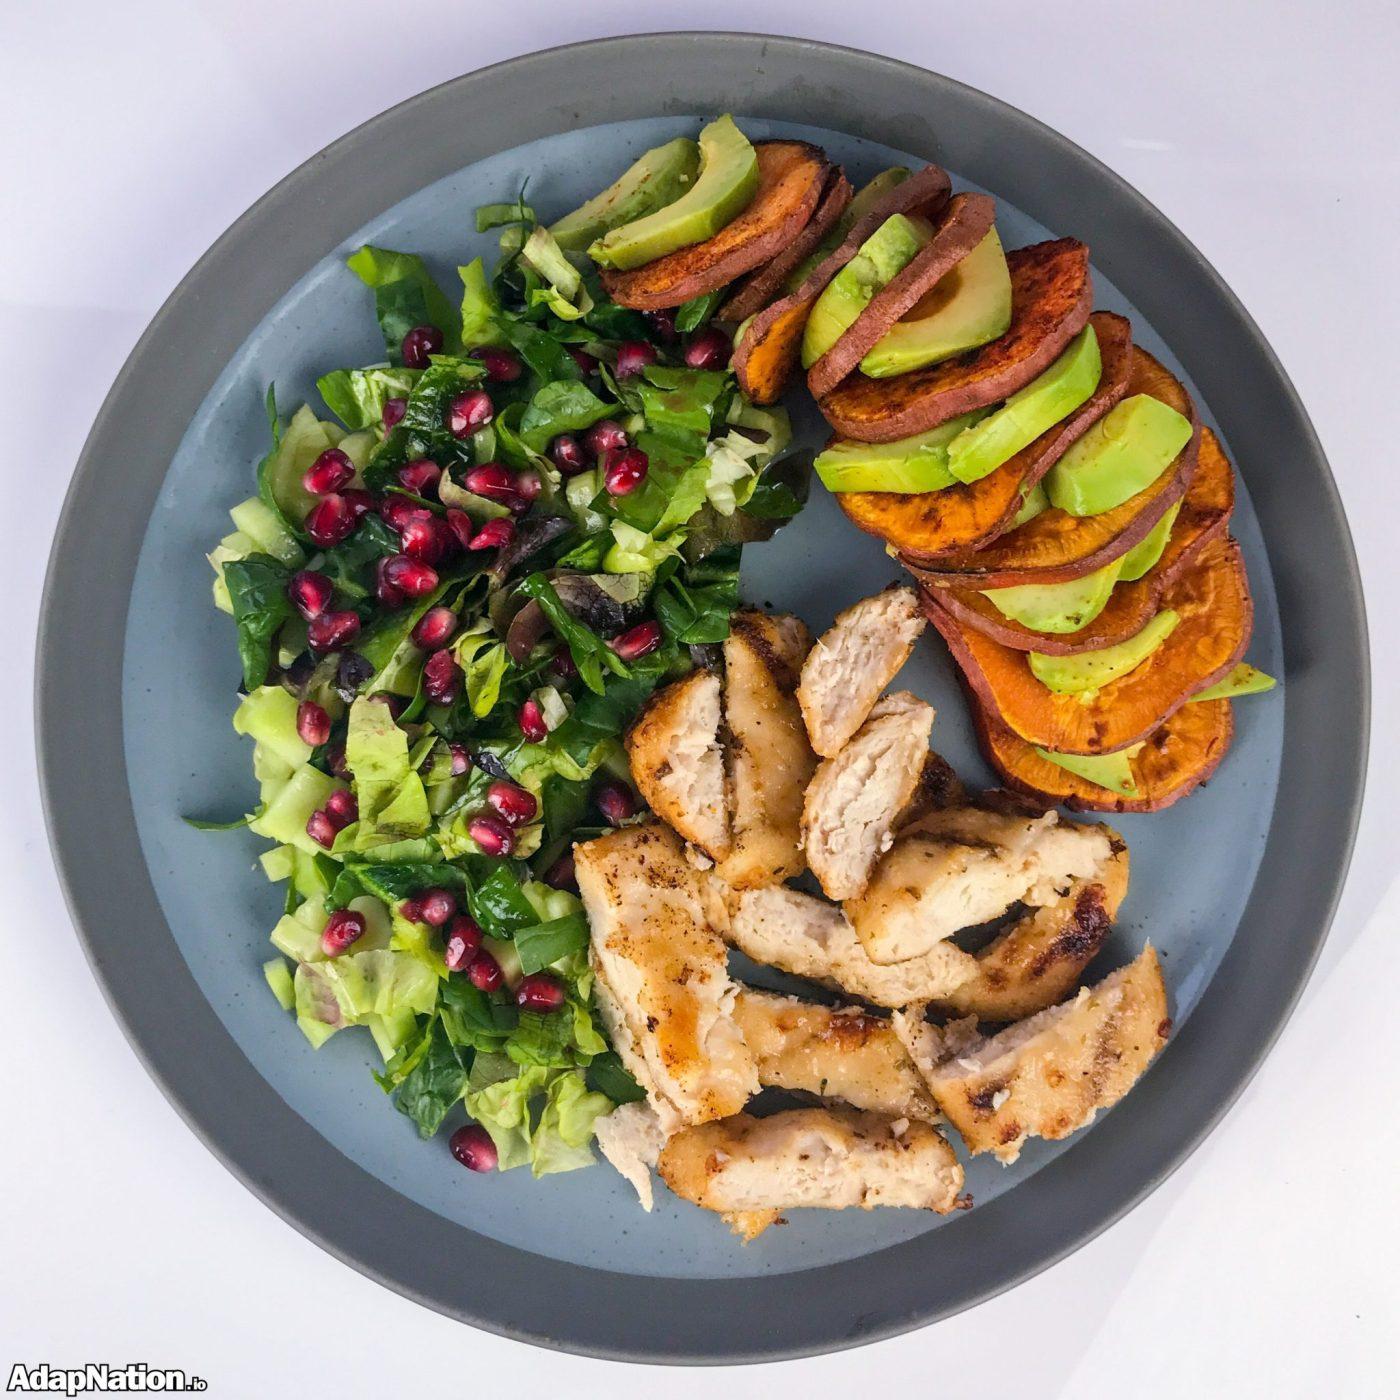 Chicken & Pomegranate Salad, with Sweet Potato & Avocado